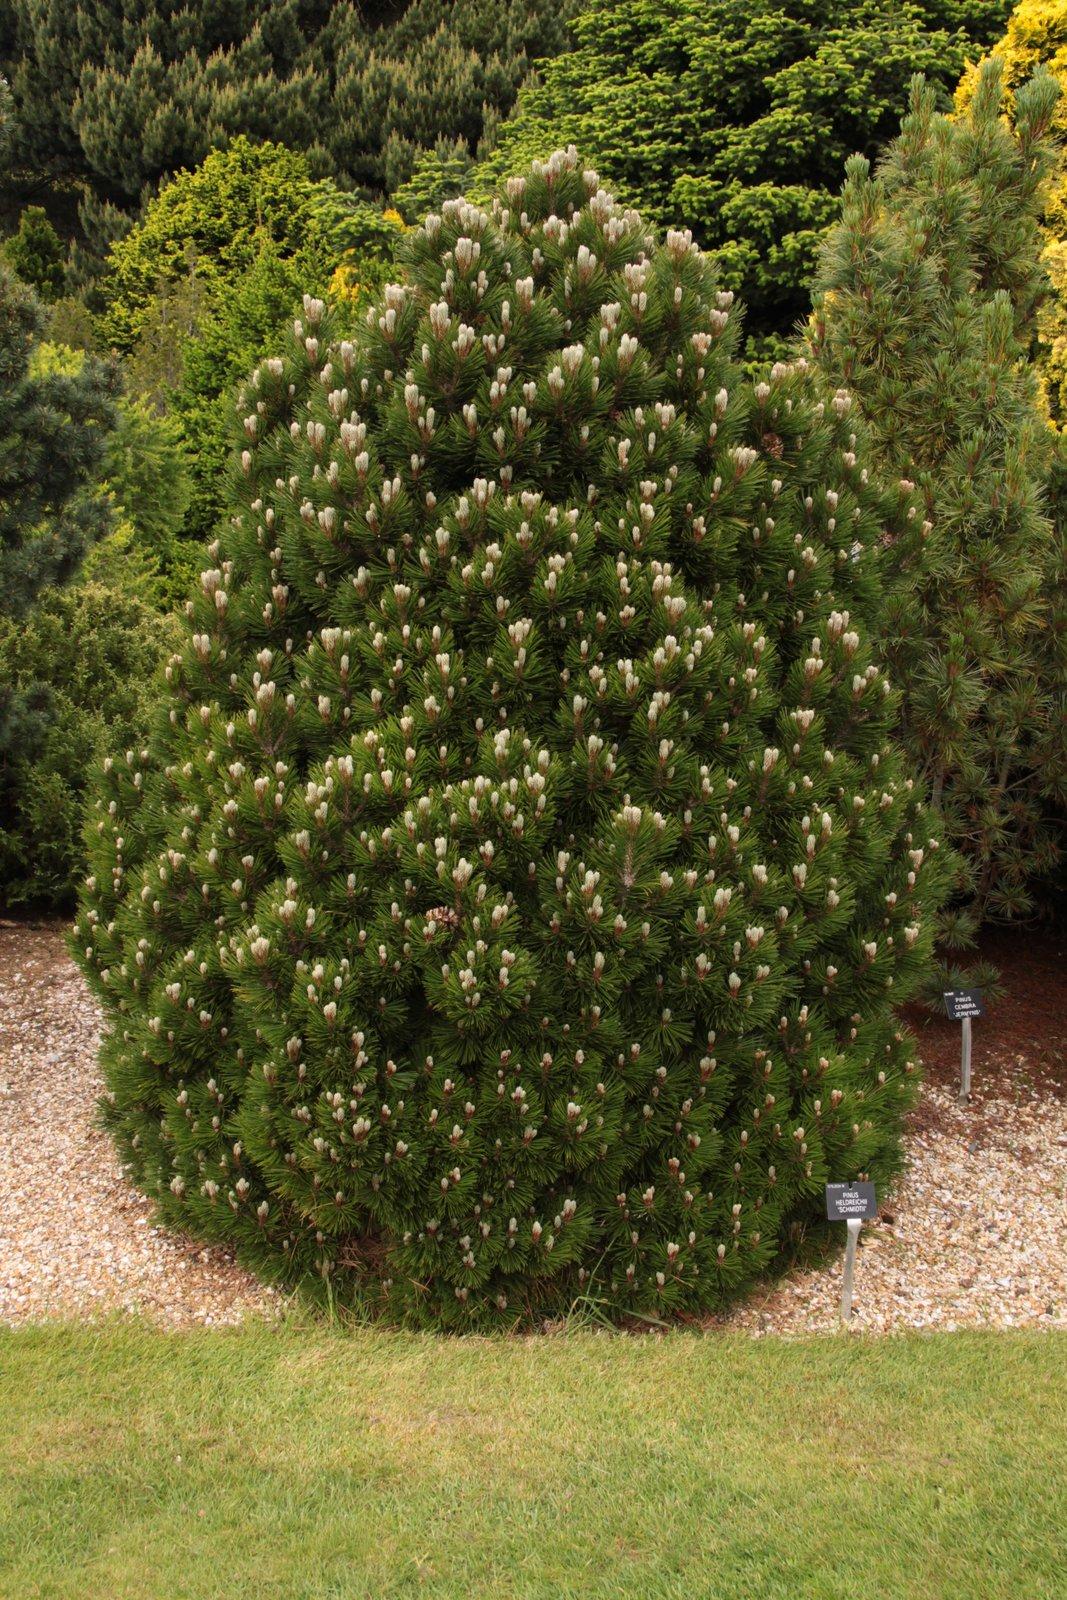 Bosnian pine 'Smidtii'